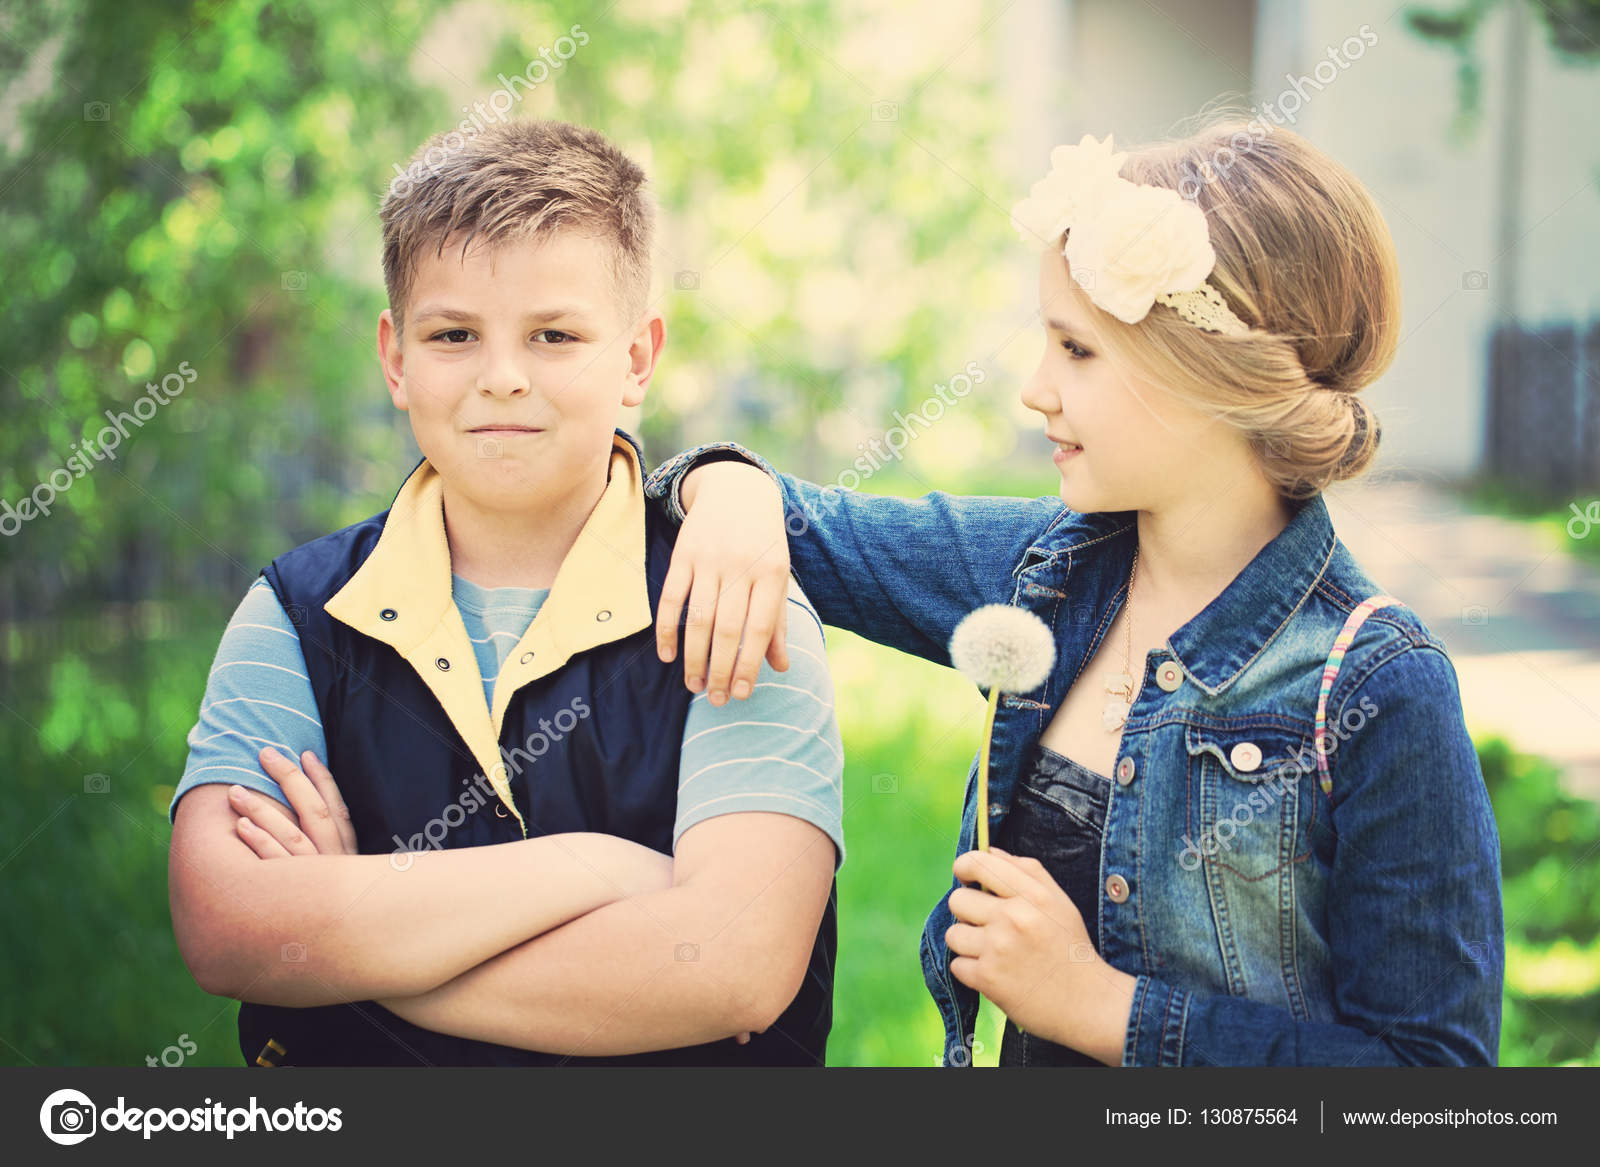 af8a46d8e51 Δύο όμορφα παιδιά σε εξωτερικούς χώρους. Νεαρό αγόρι εξετάζει το ...